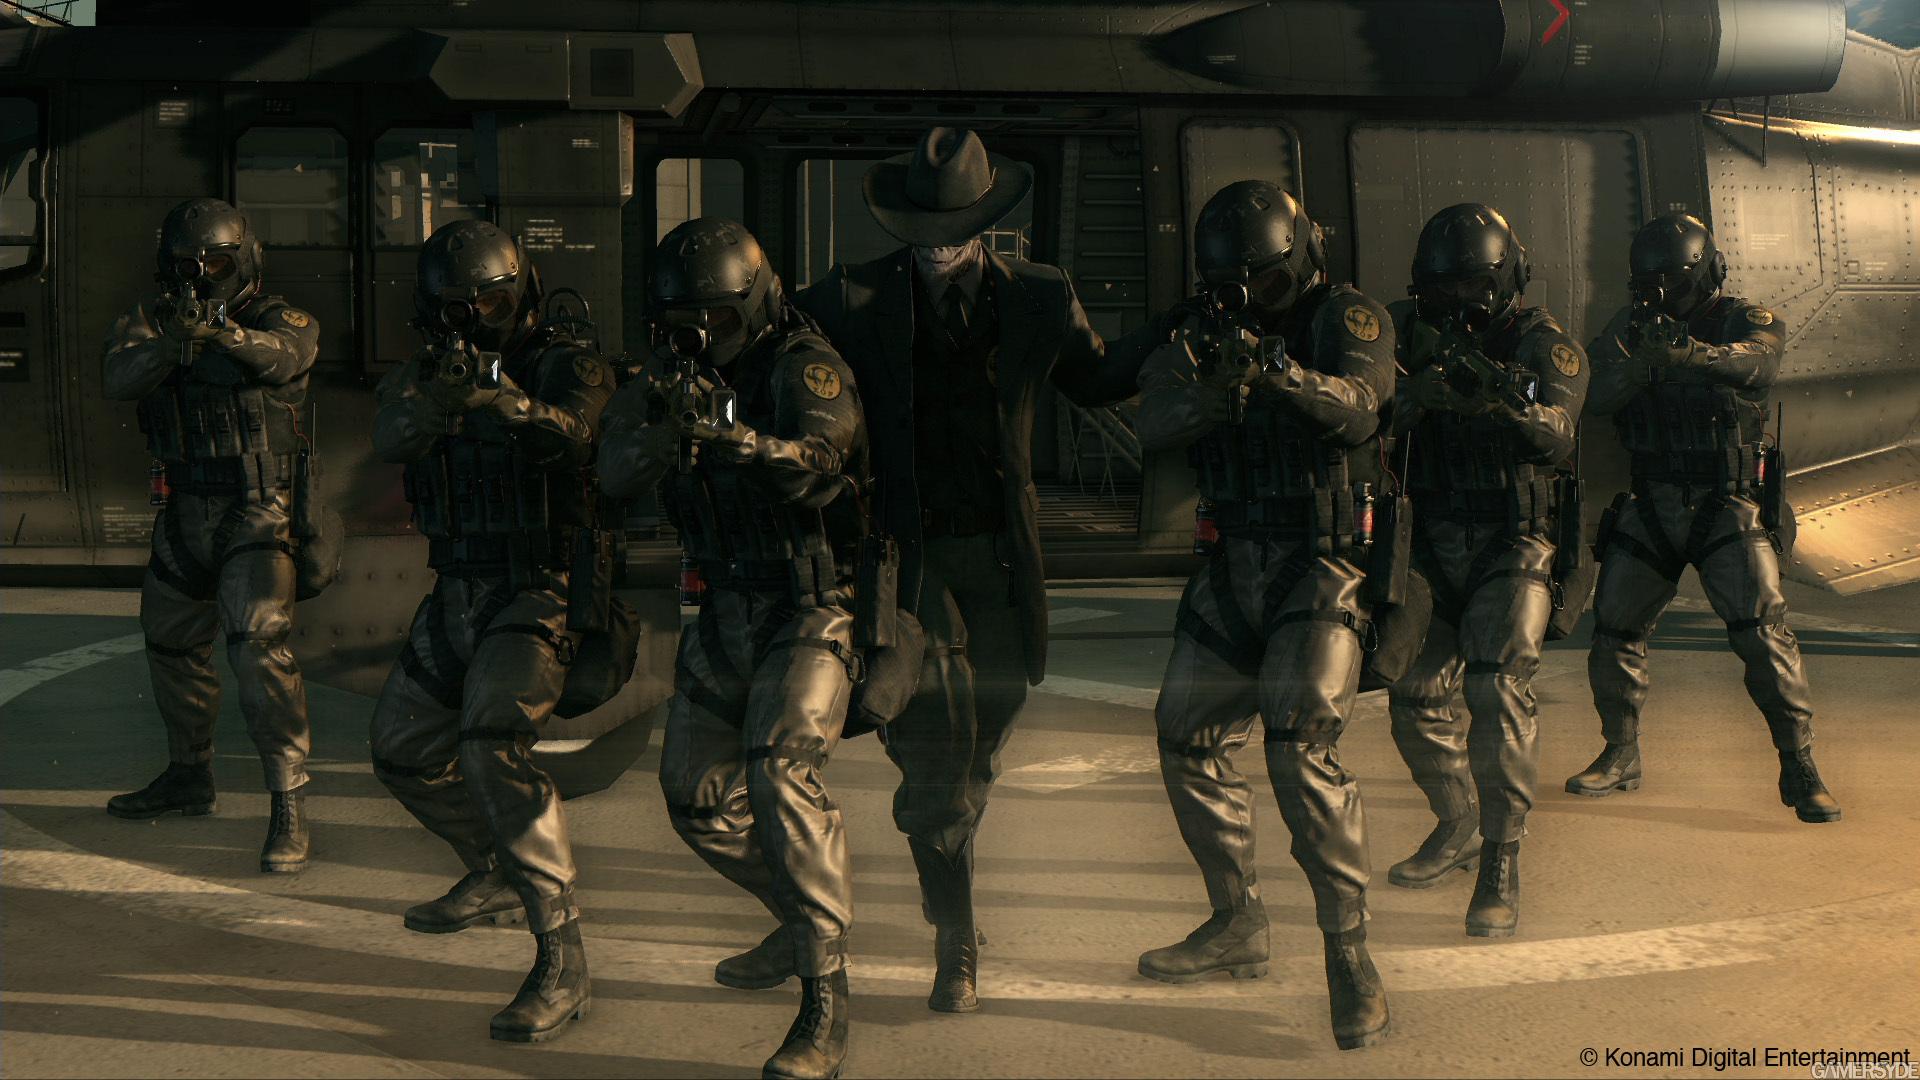 image metal gear solid v the phantom pain 22381 2584 0013 بازگشت پر سر و صدای مار بی صدا ! | تحلیل و بررسی نمایش Metal Gear Solid V : The Phantom Pain در نمایشگاه E3 2013